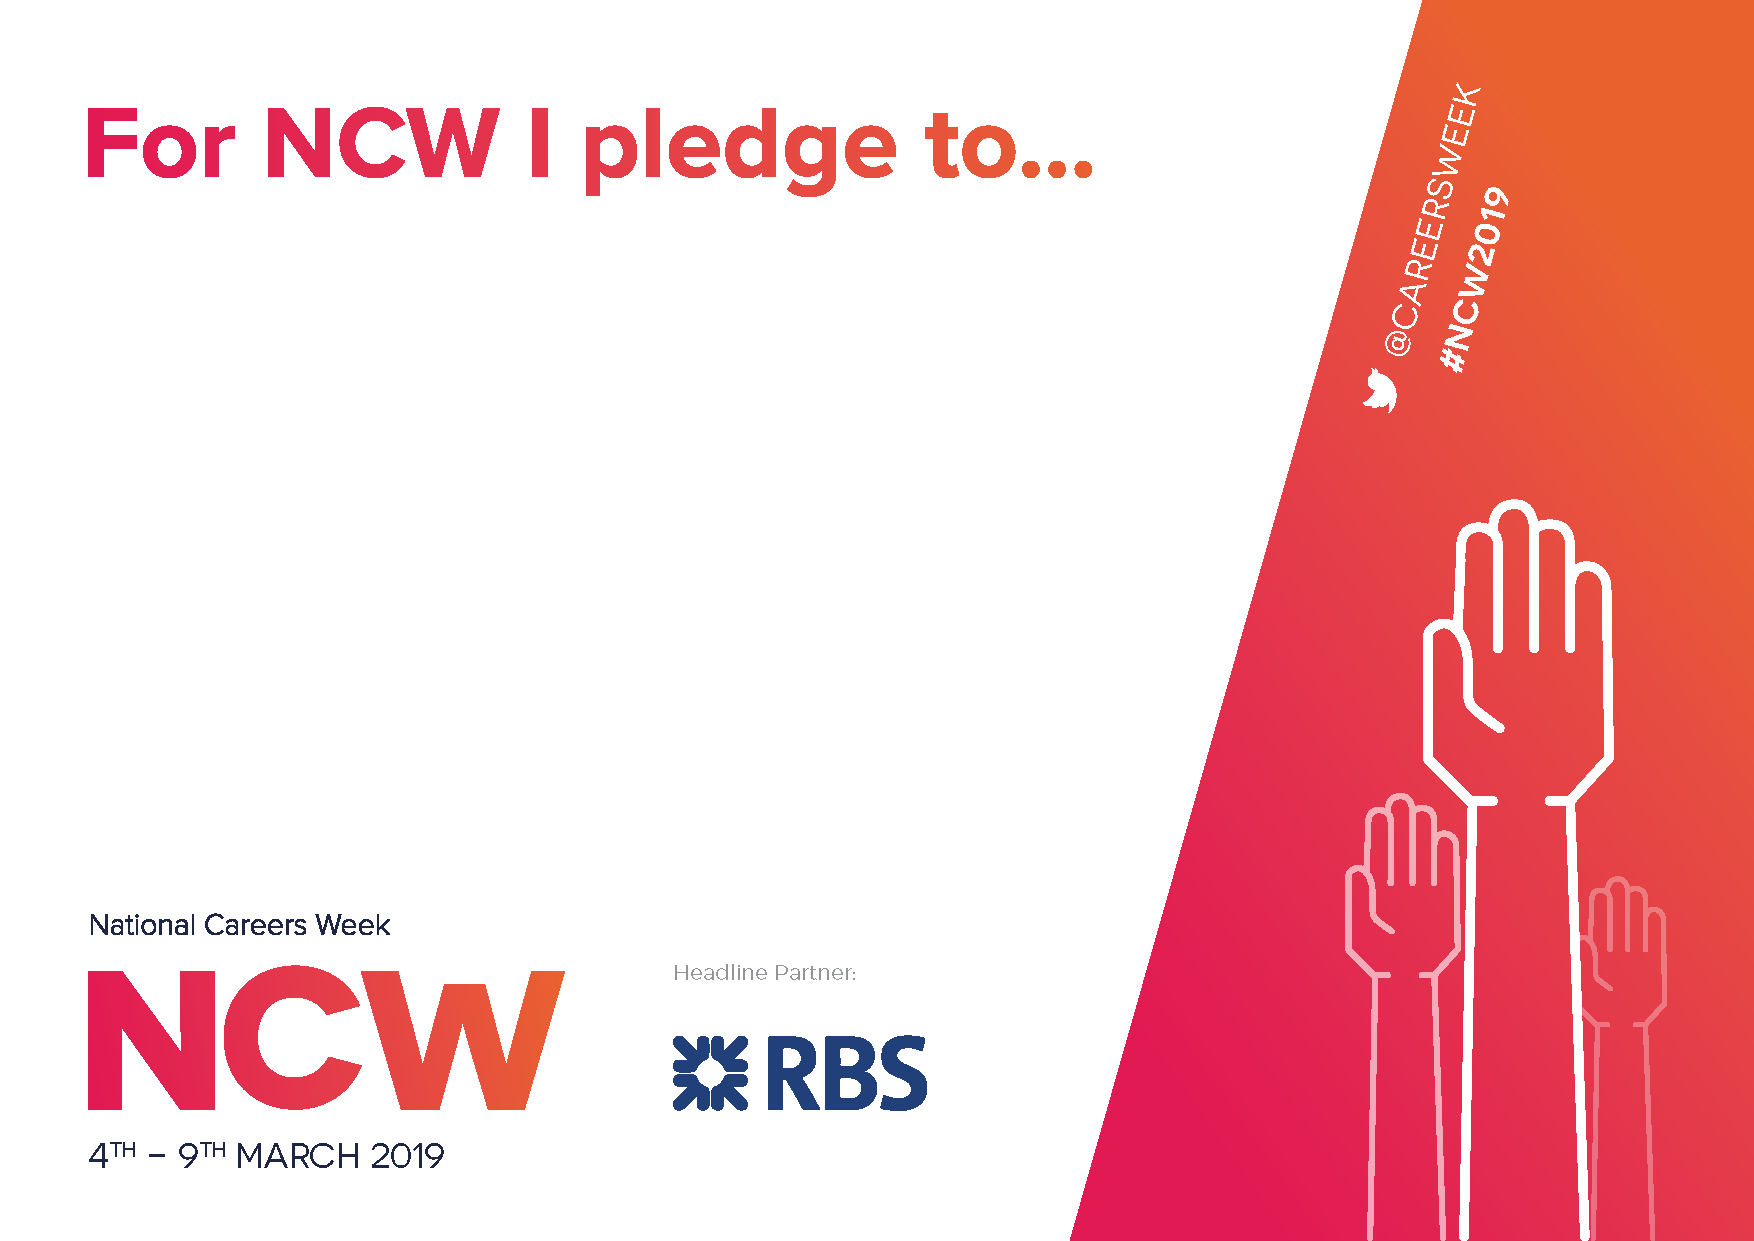 Ncw 2019 Printable Pledge Card – National Careers Week For Free Pledge Card Template